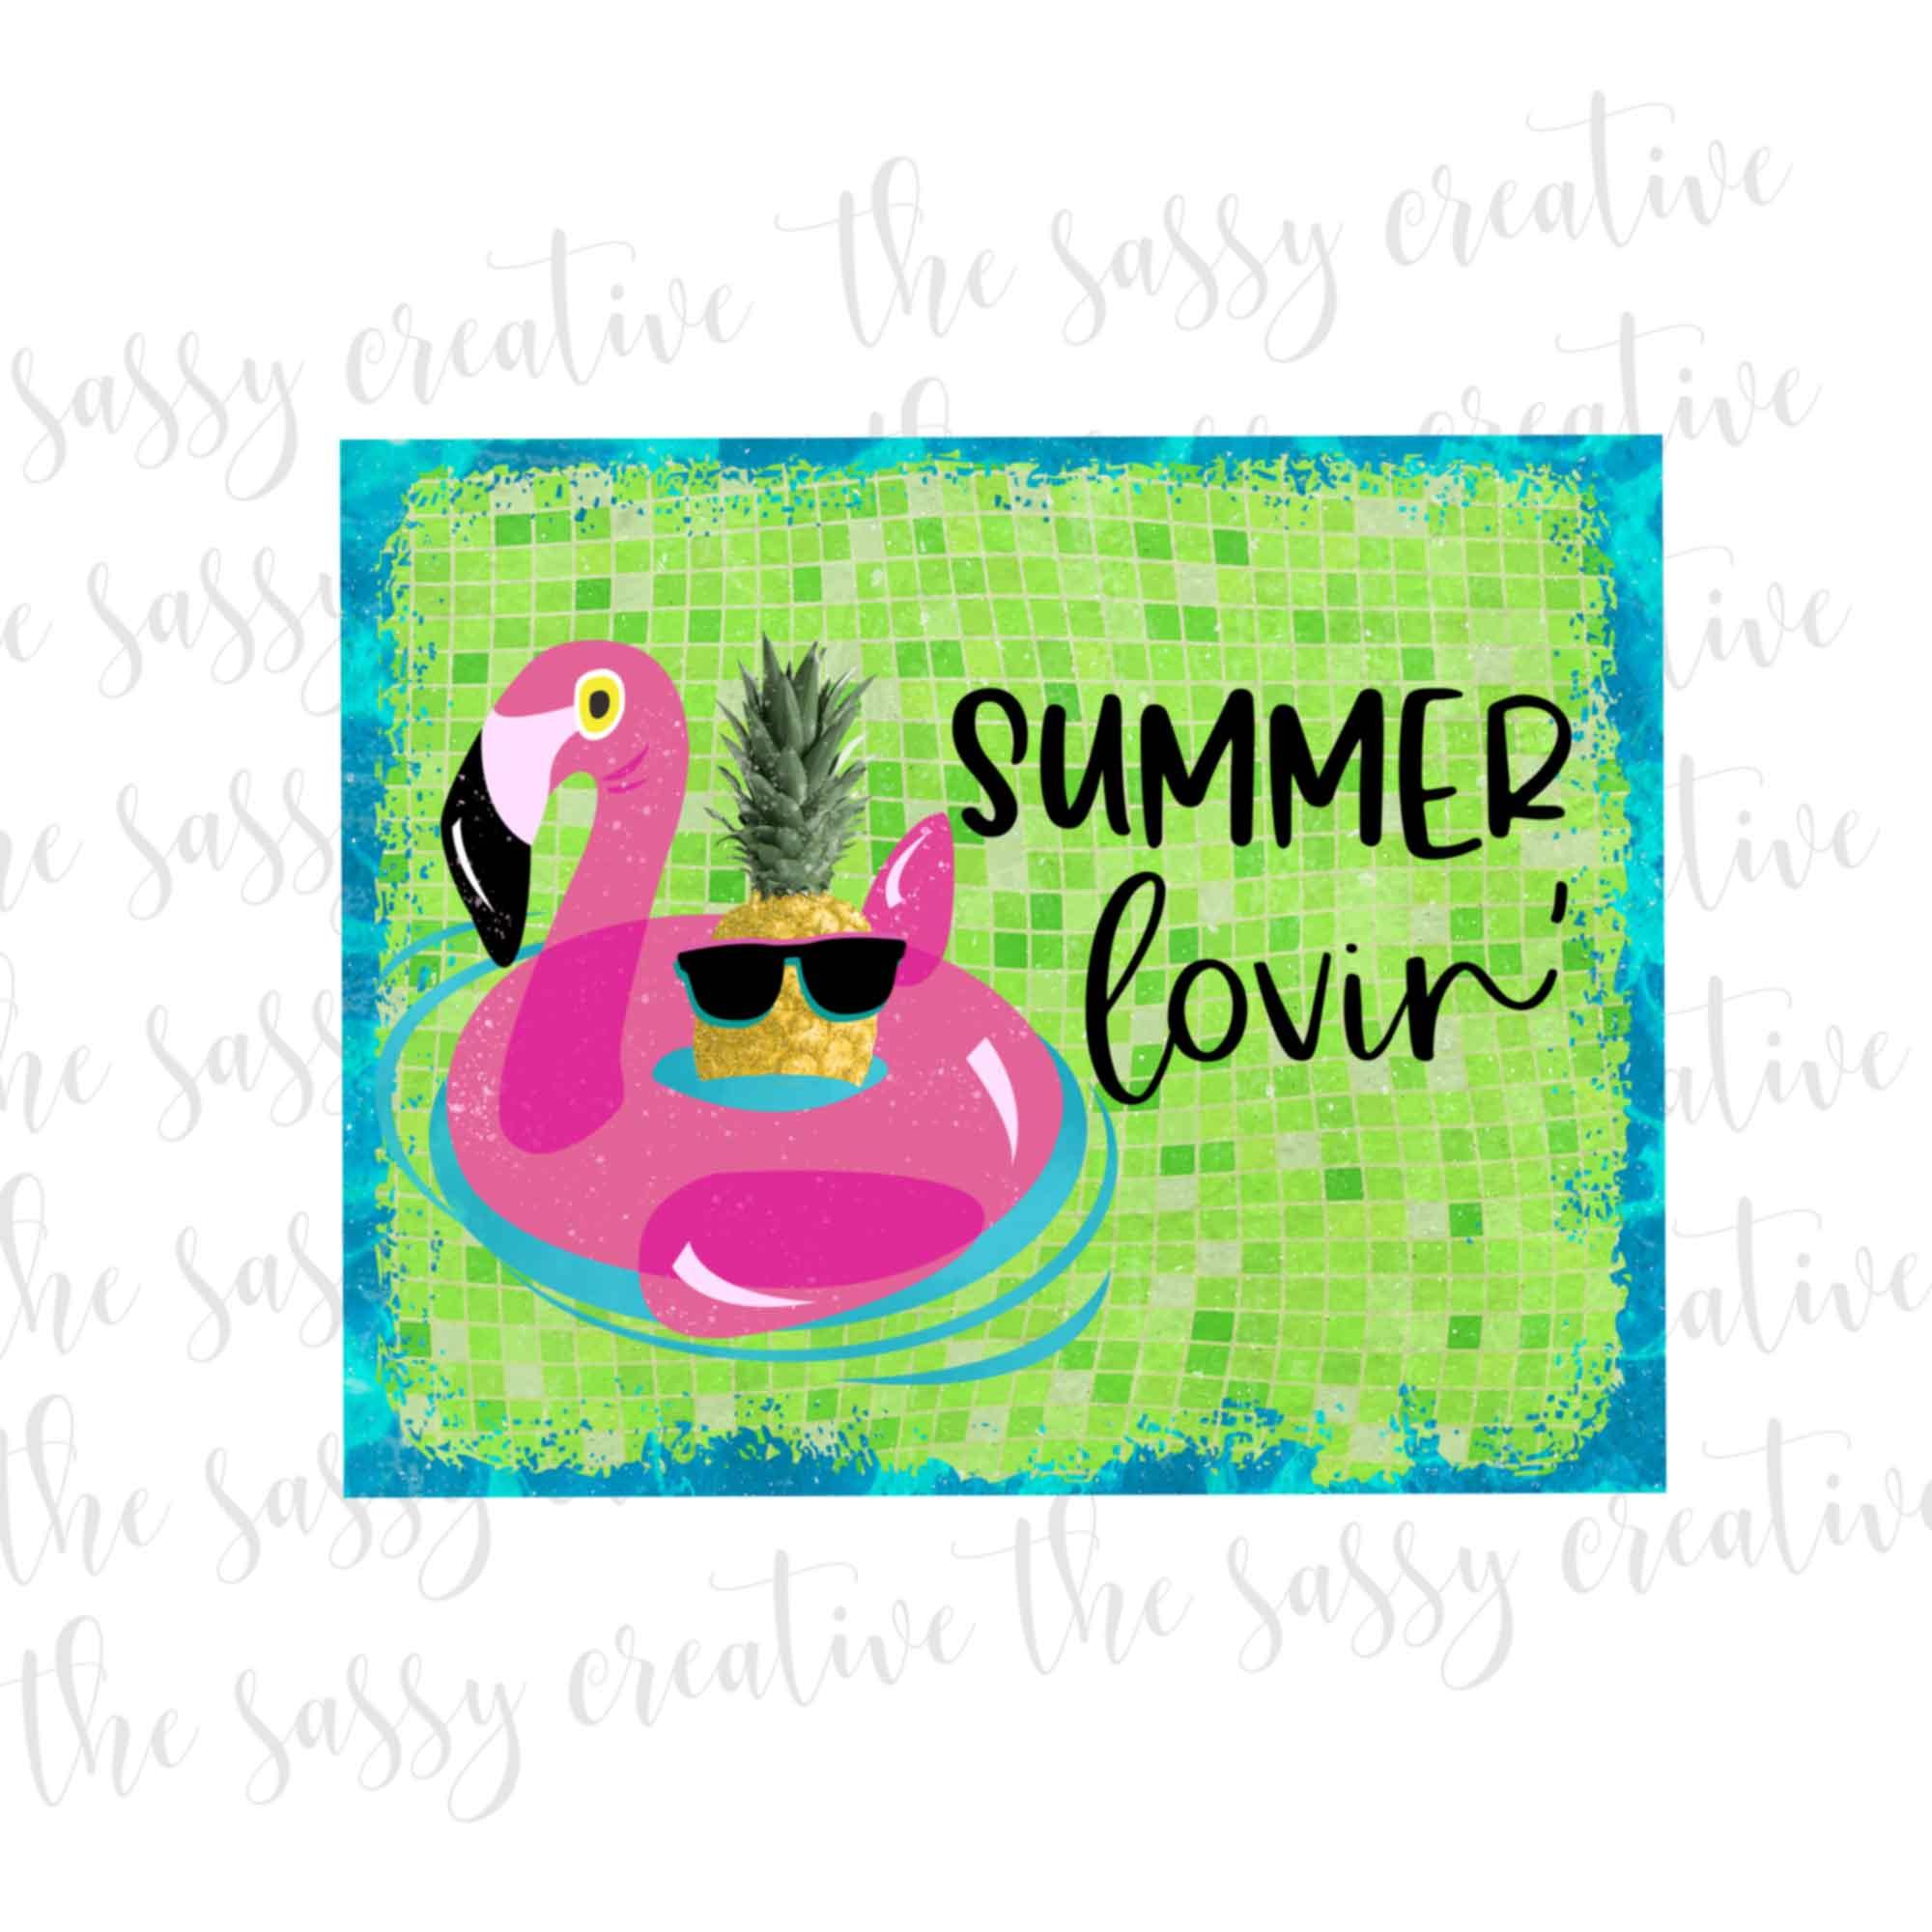 summerlovincover